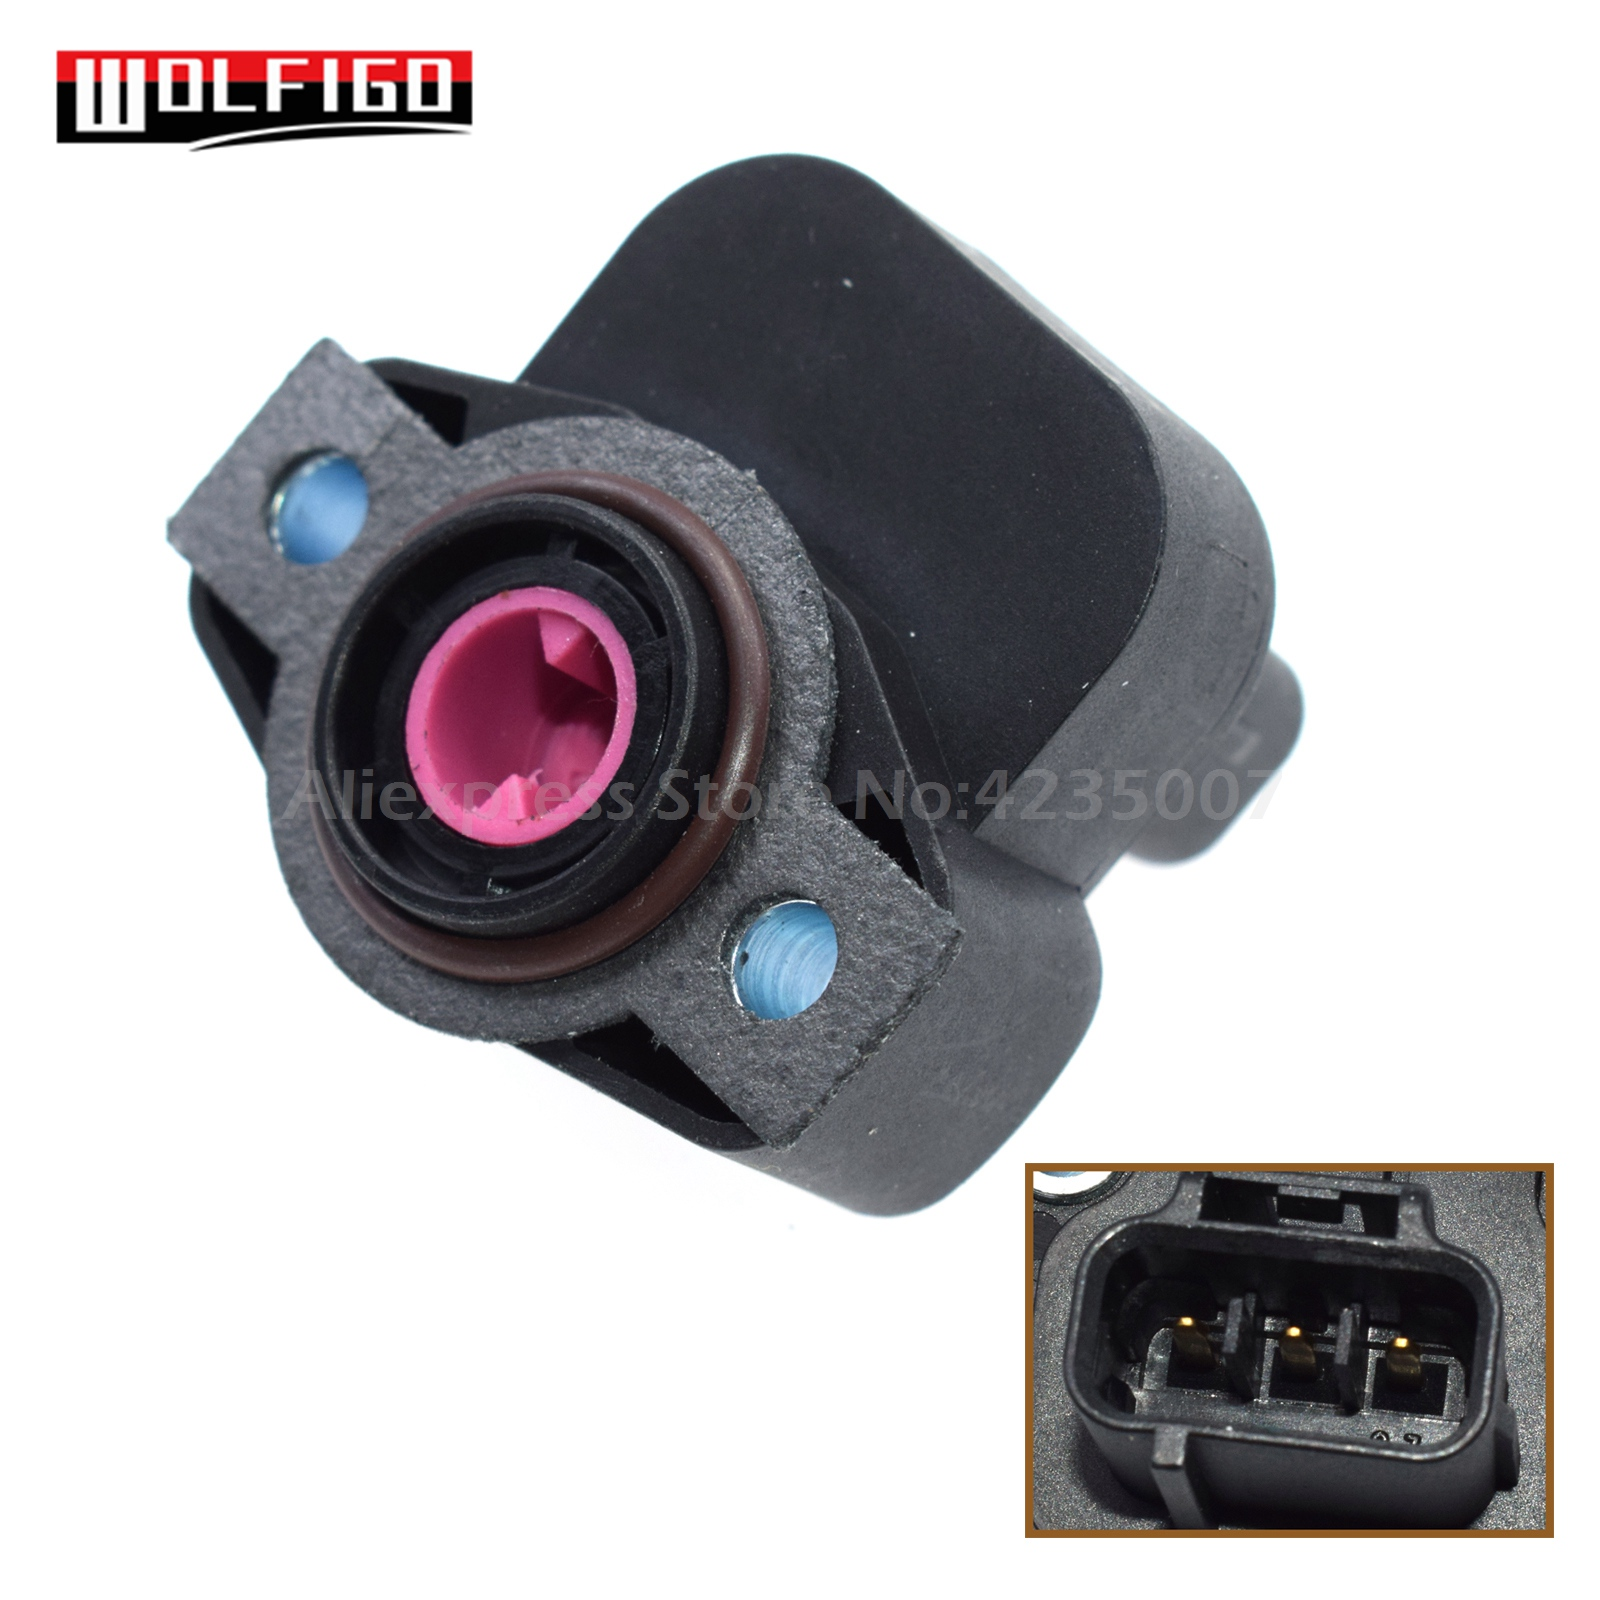 WOLFIGO New Throttle Position Sensor TPS For Chrysler Dodge Plymouth 4874371,4606083 4874371AB 4874371AC 4874371AF 4686360